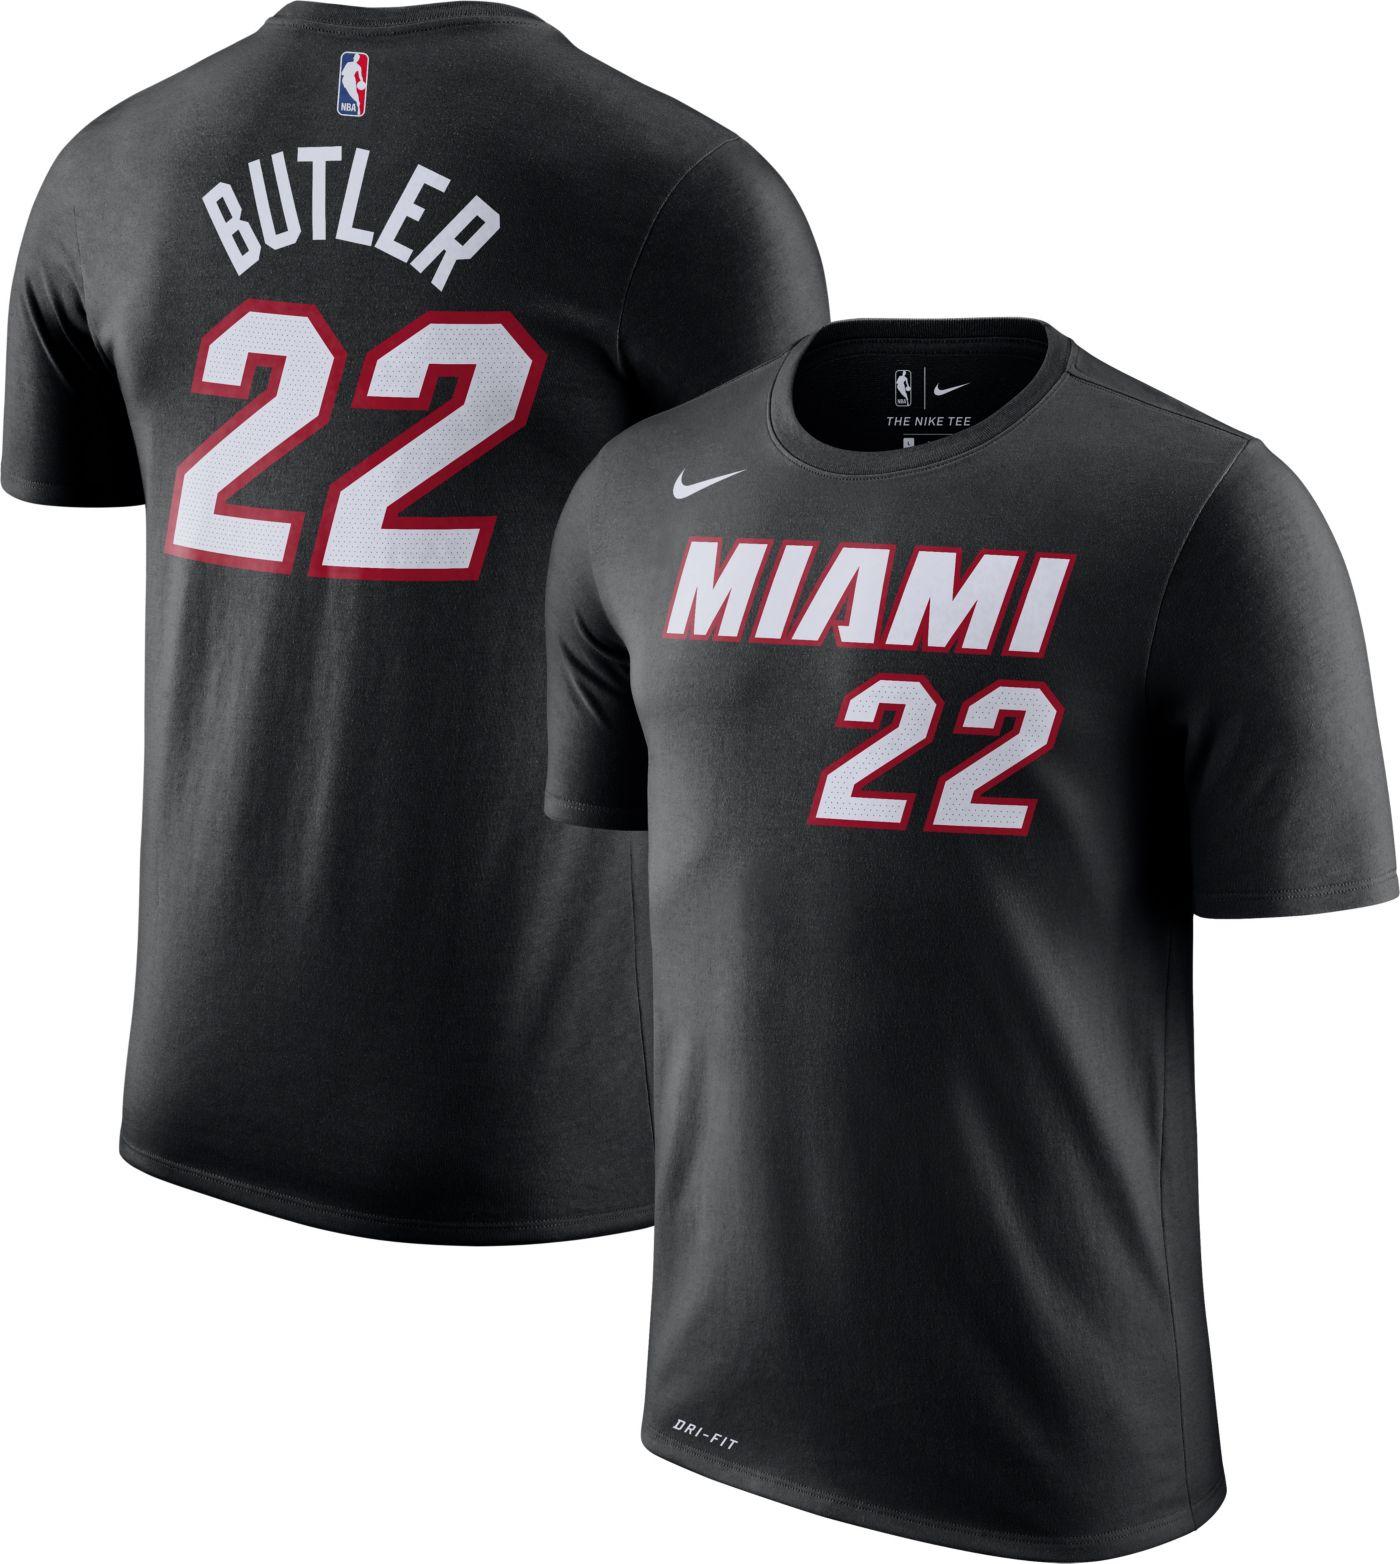 Nike Men's Miami Heat Jimmy Butler #22 Dri-FIT Black T-Shirt